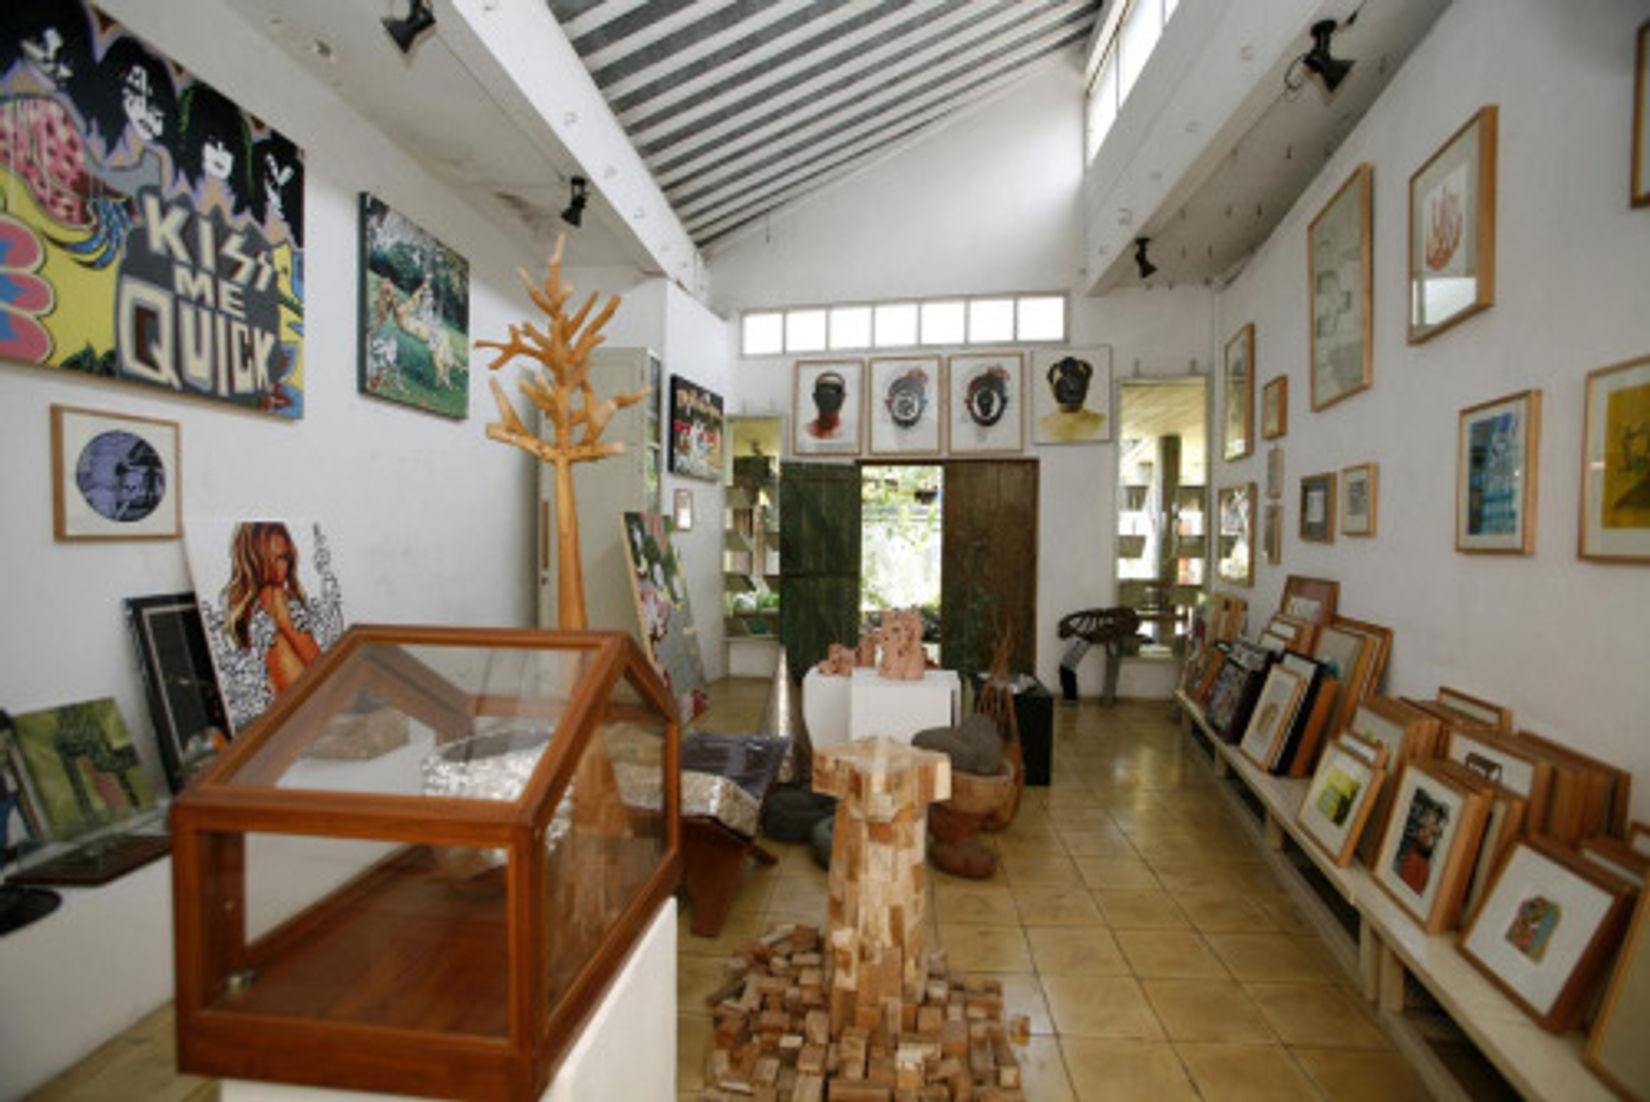 Artists Collectives in Yogyakarta